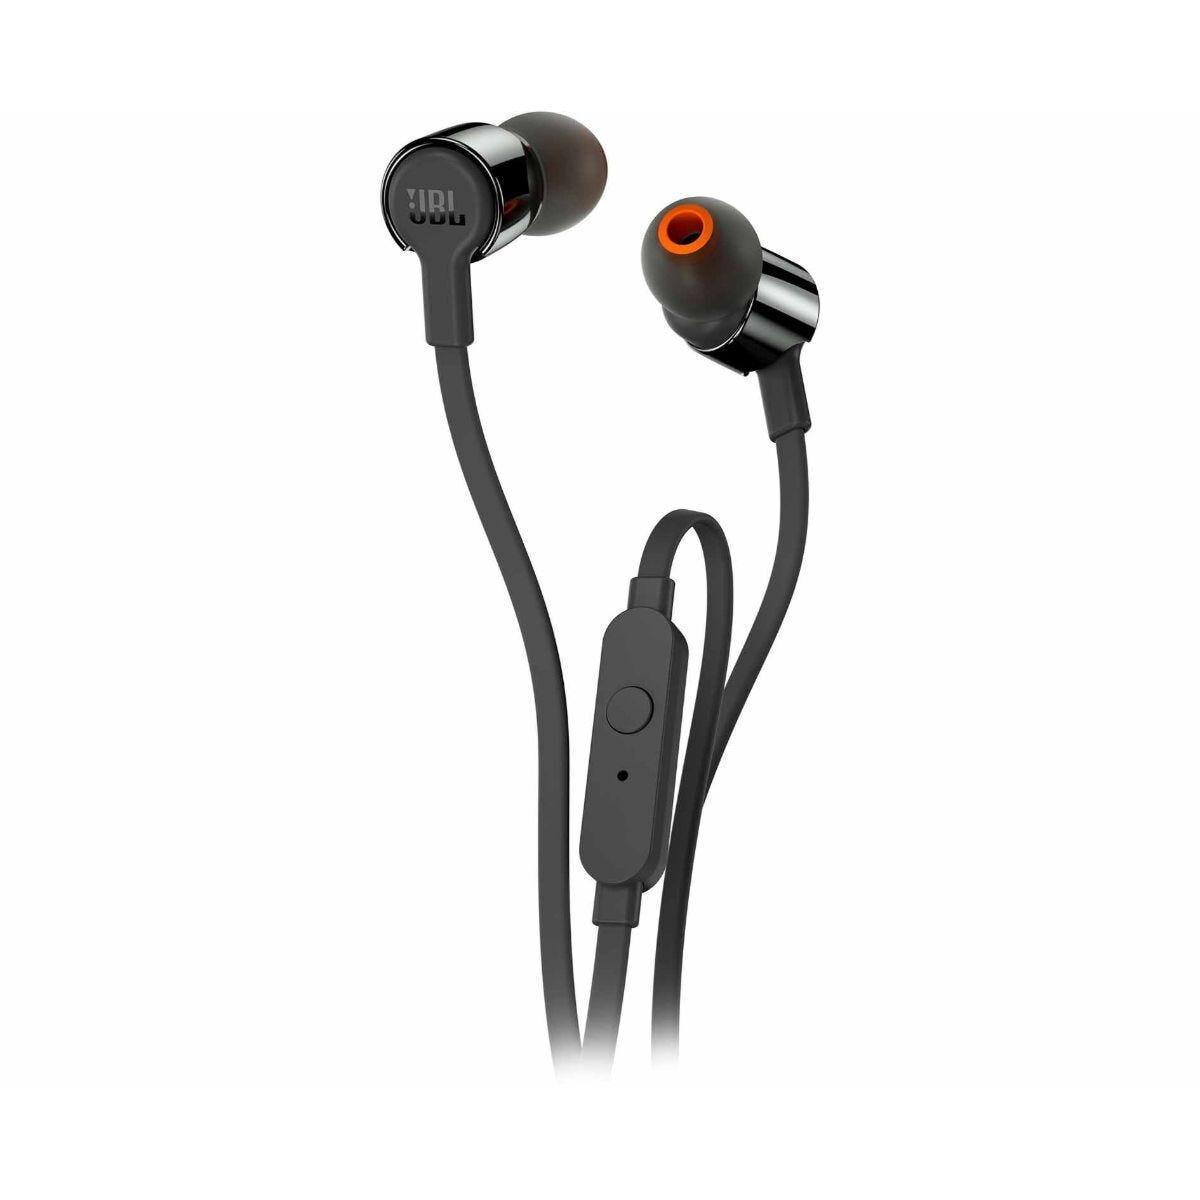 JBL Tune 210 Wired In-Ear Headphones